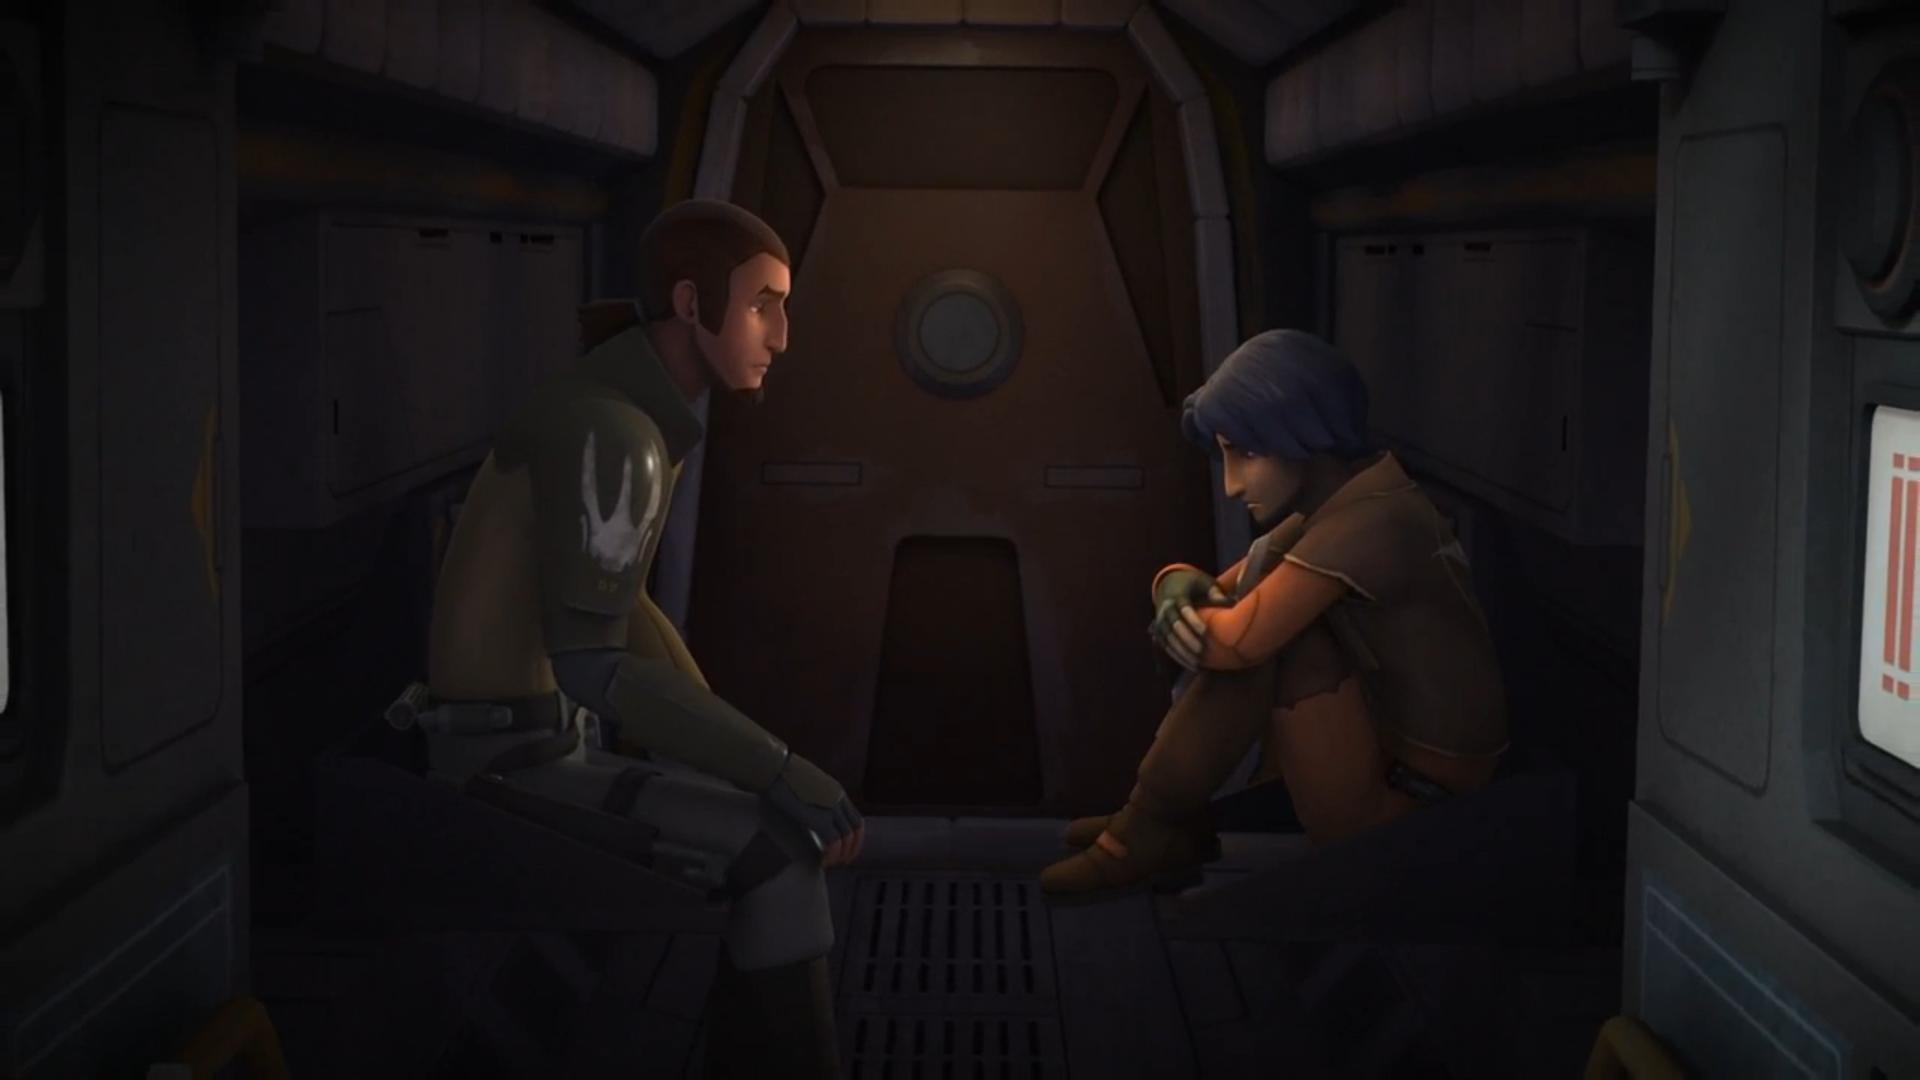 Obi-Wan and his on the edge of giving into hatredPadawan Learner Anakin... wait... just kidding, that's Kadan and Ezra from Rebels. JK.